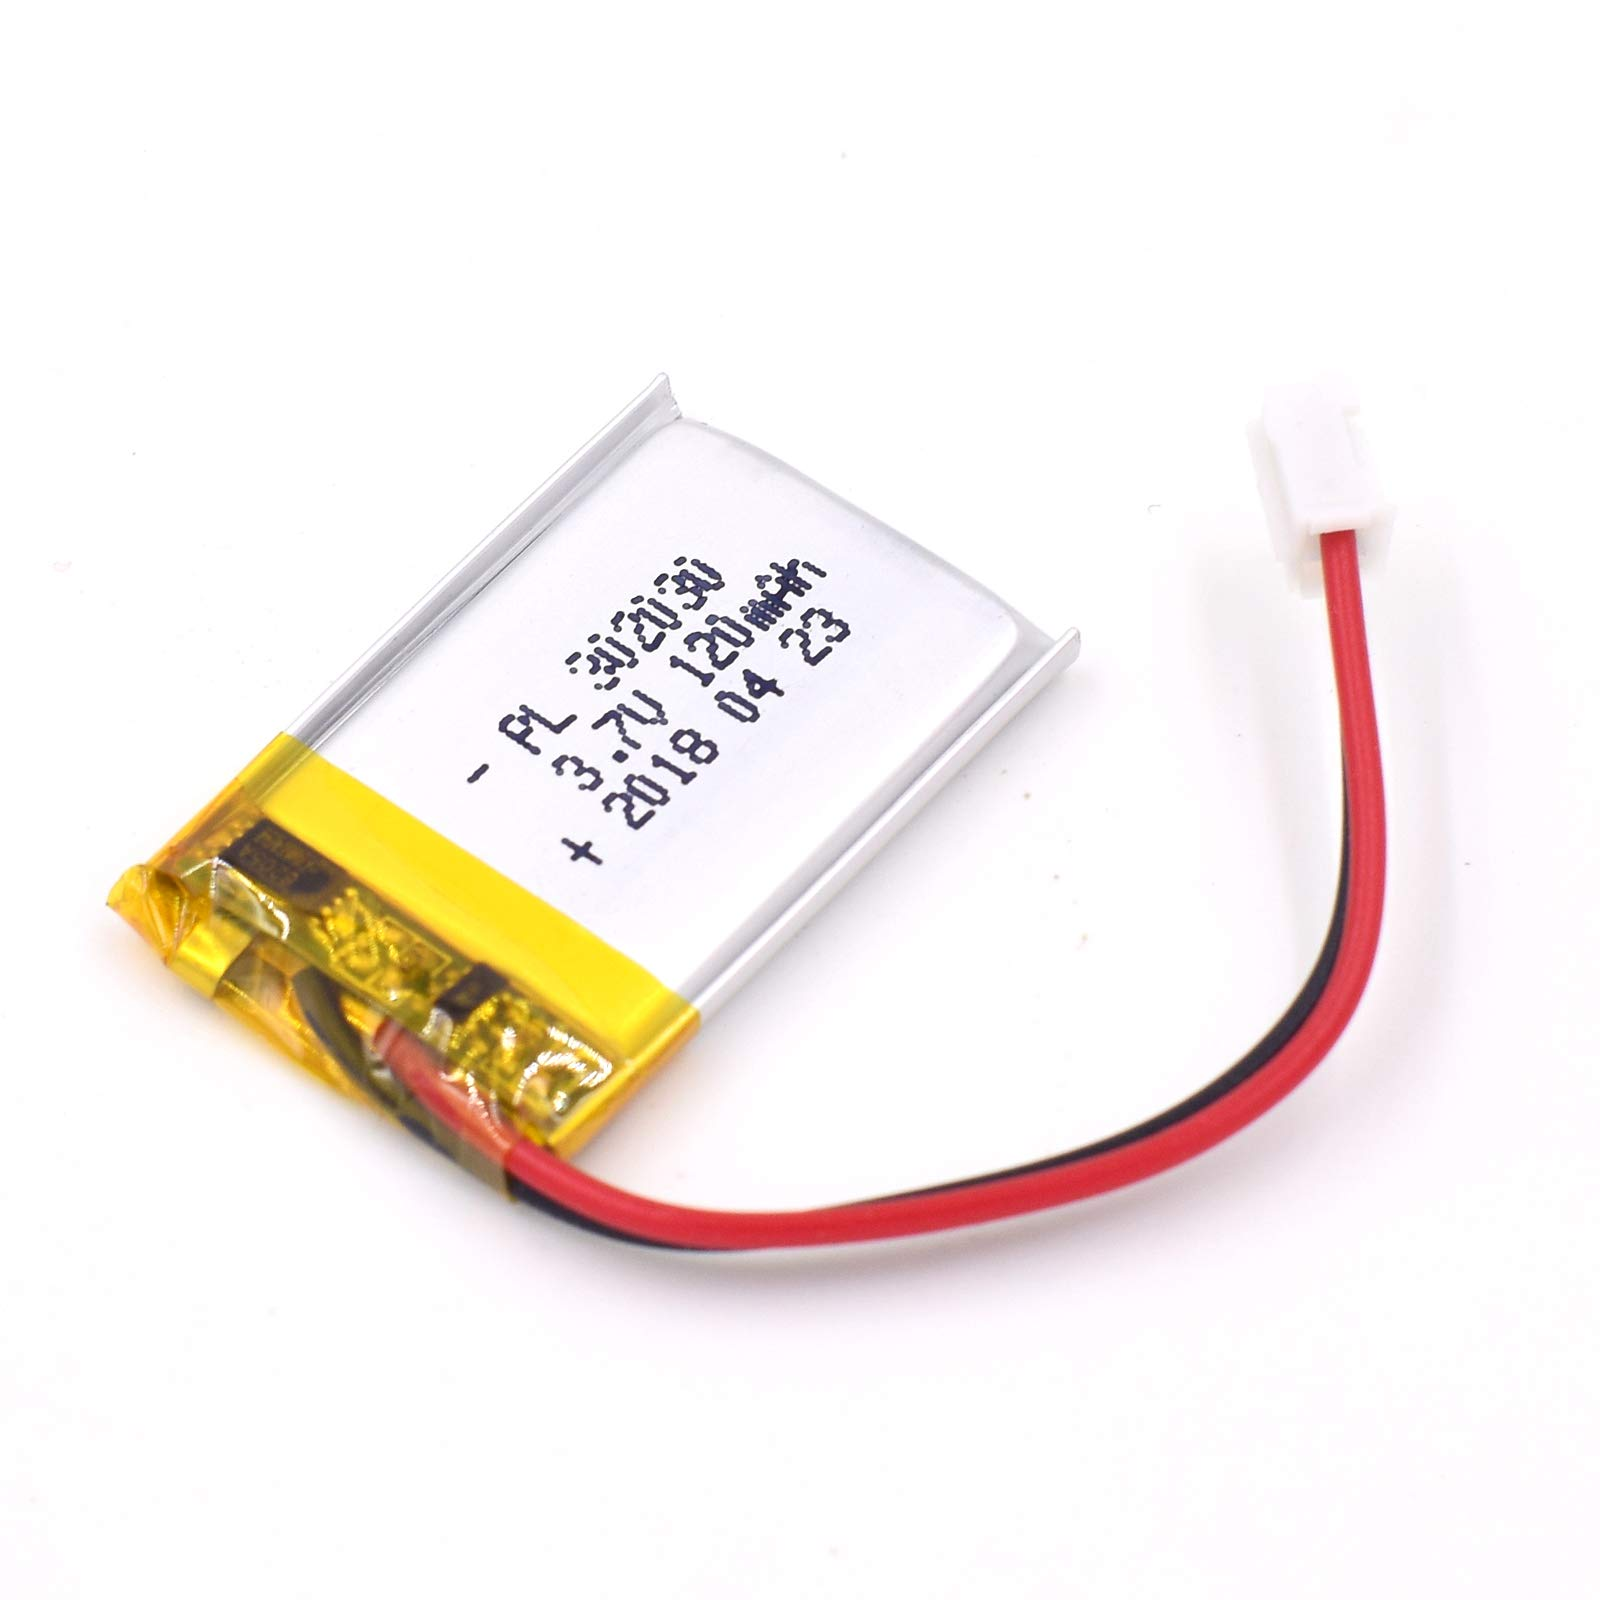 Bateria Lipo 3.7V 120mAh 302030 Recargable JST Conector